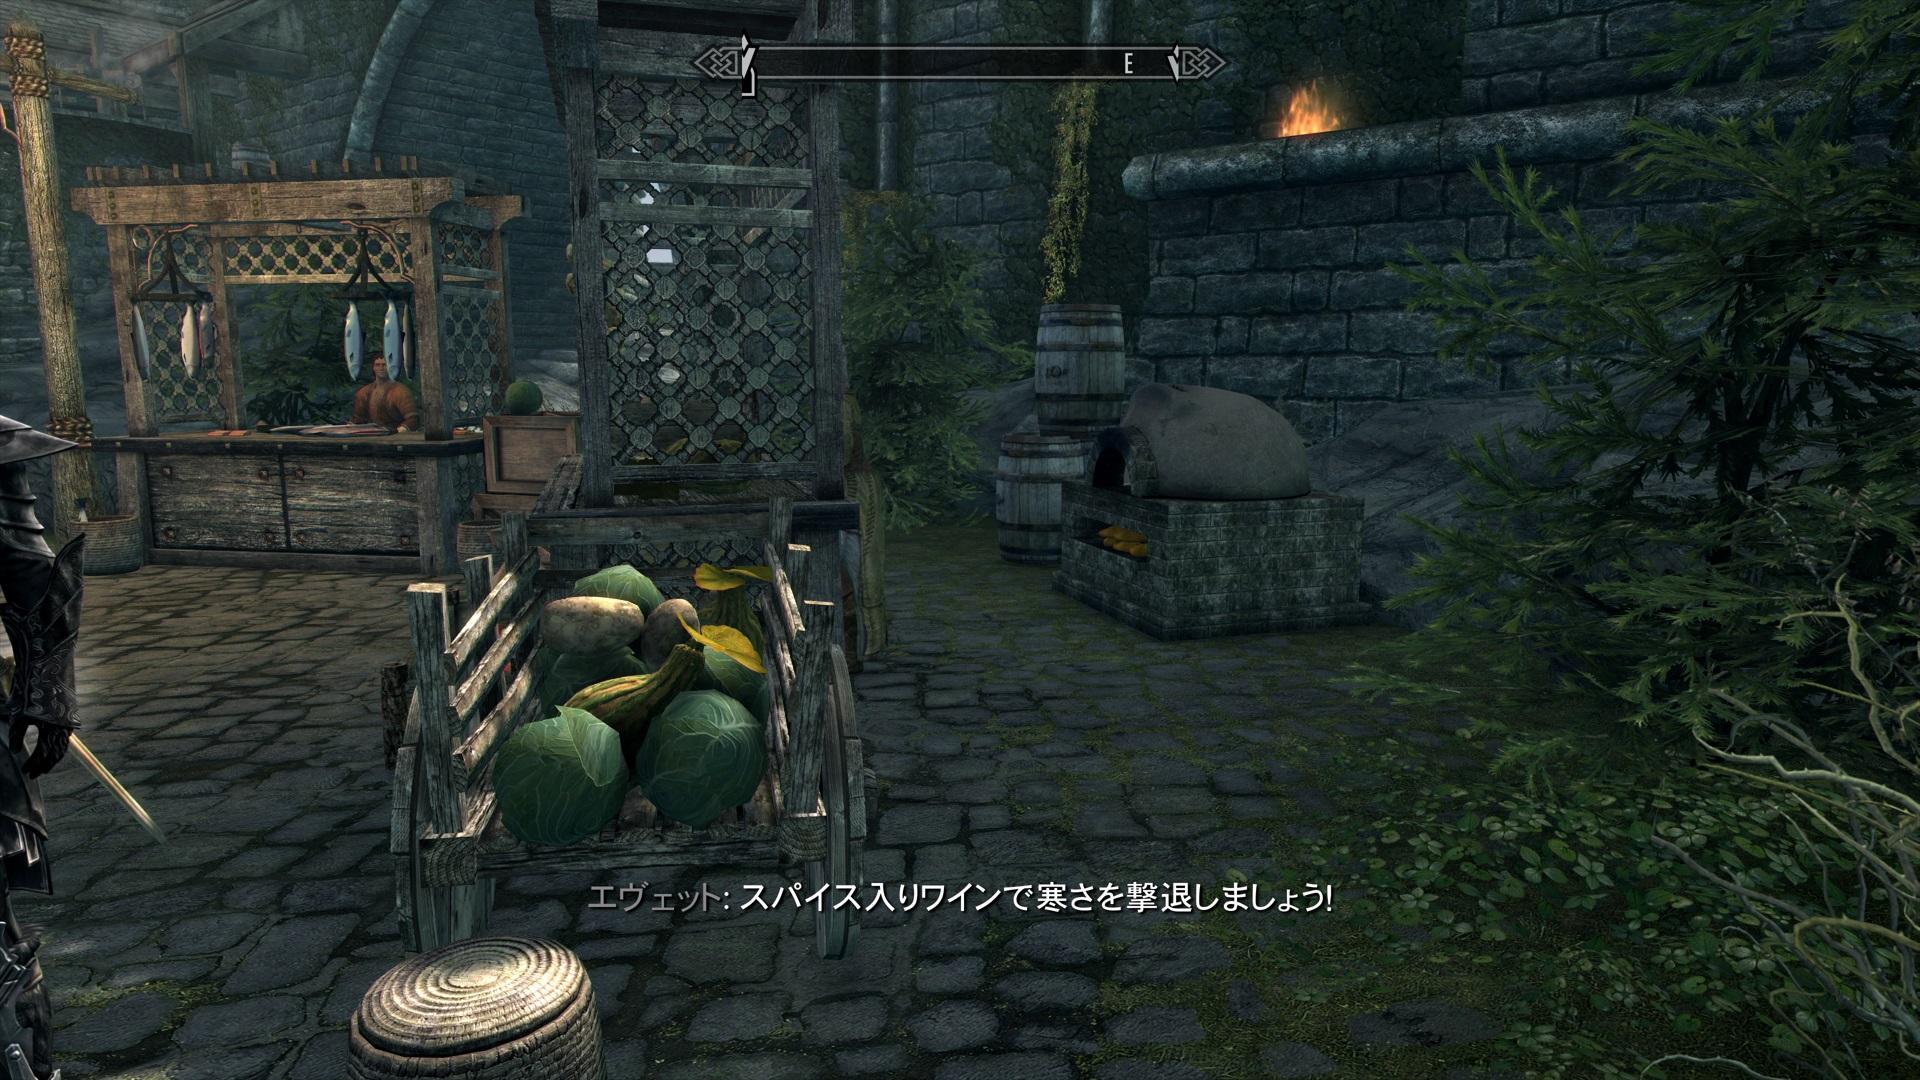 PS4スカイリム]MOD紹介222 - ゲームの玉子様